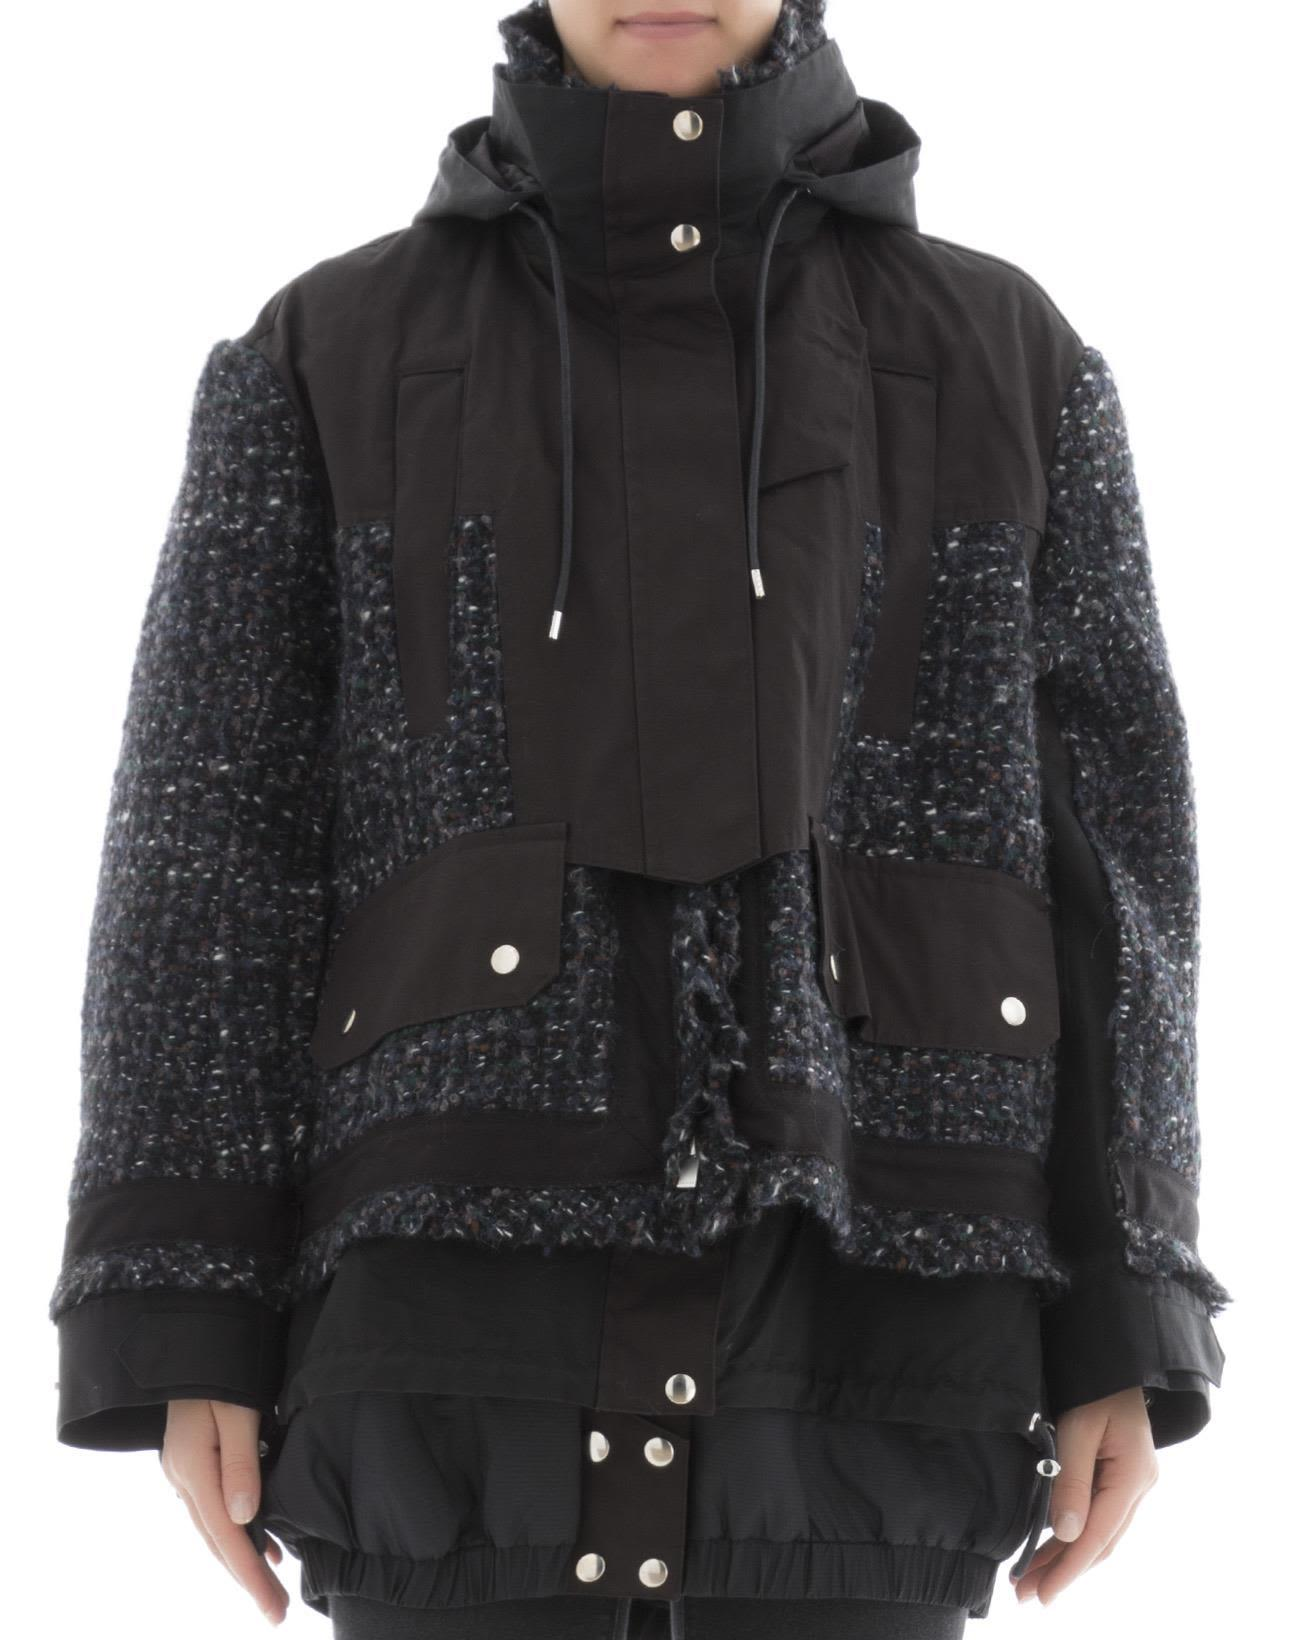 Sacai Multicolor Wool Jacket